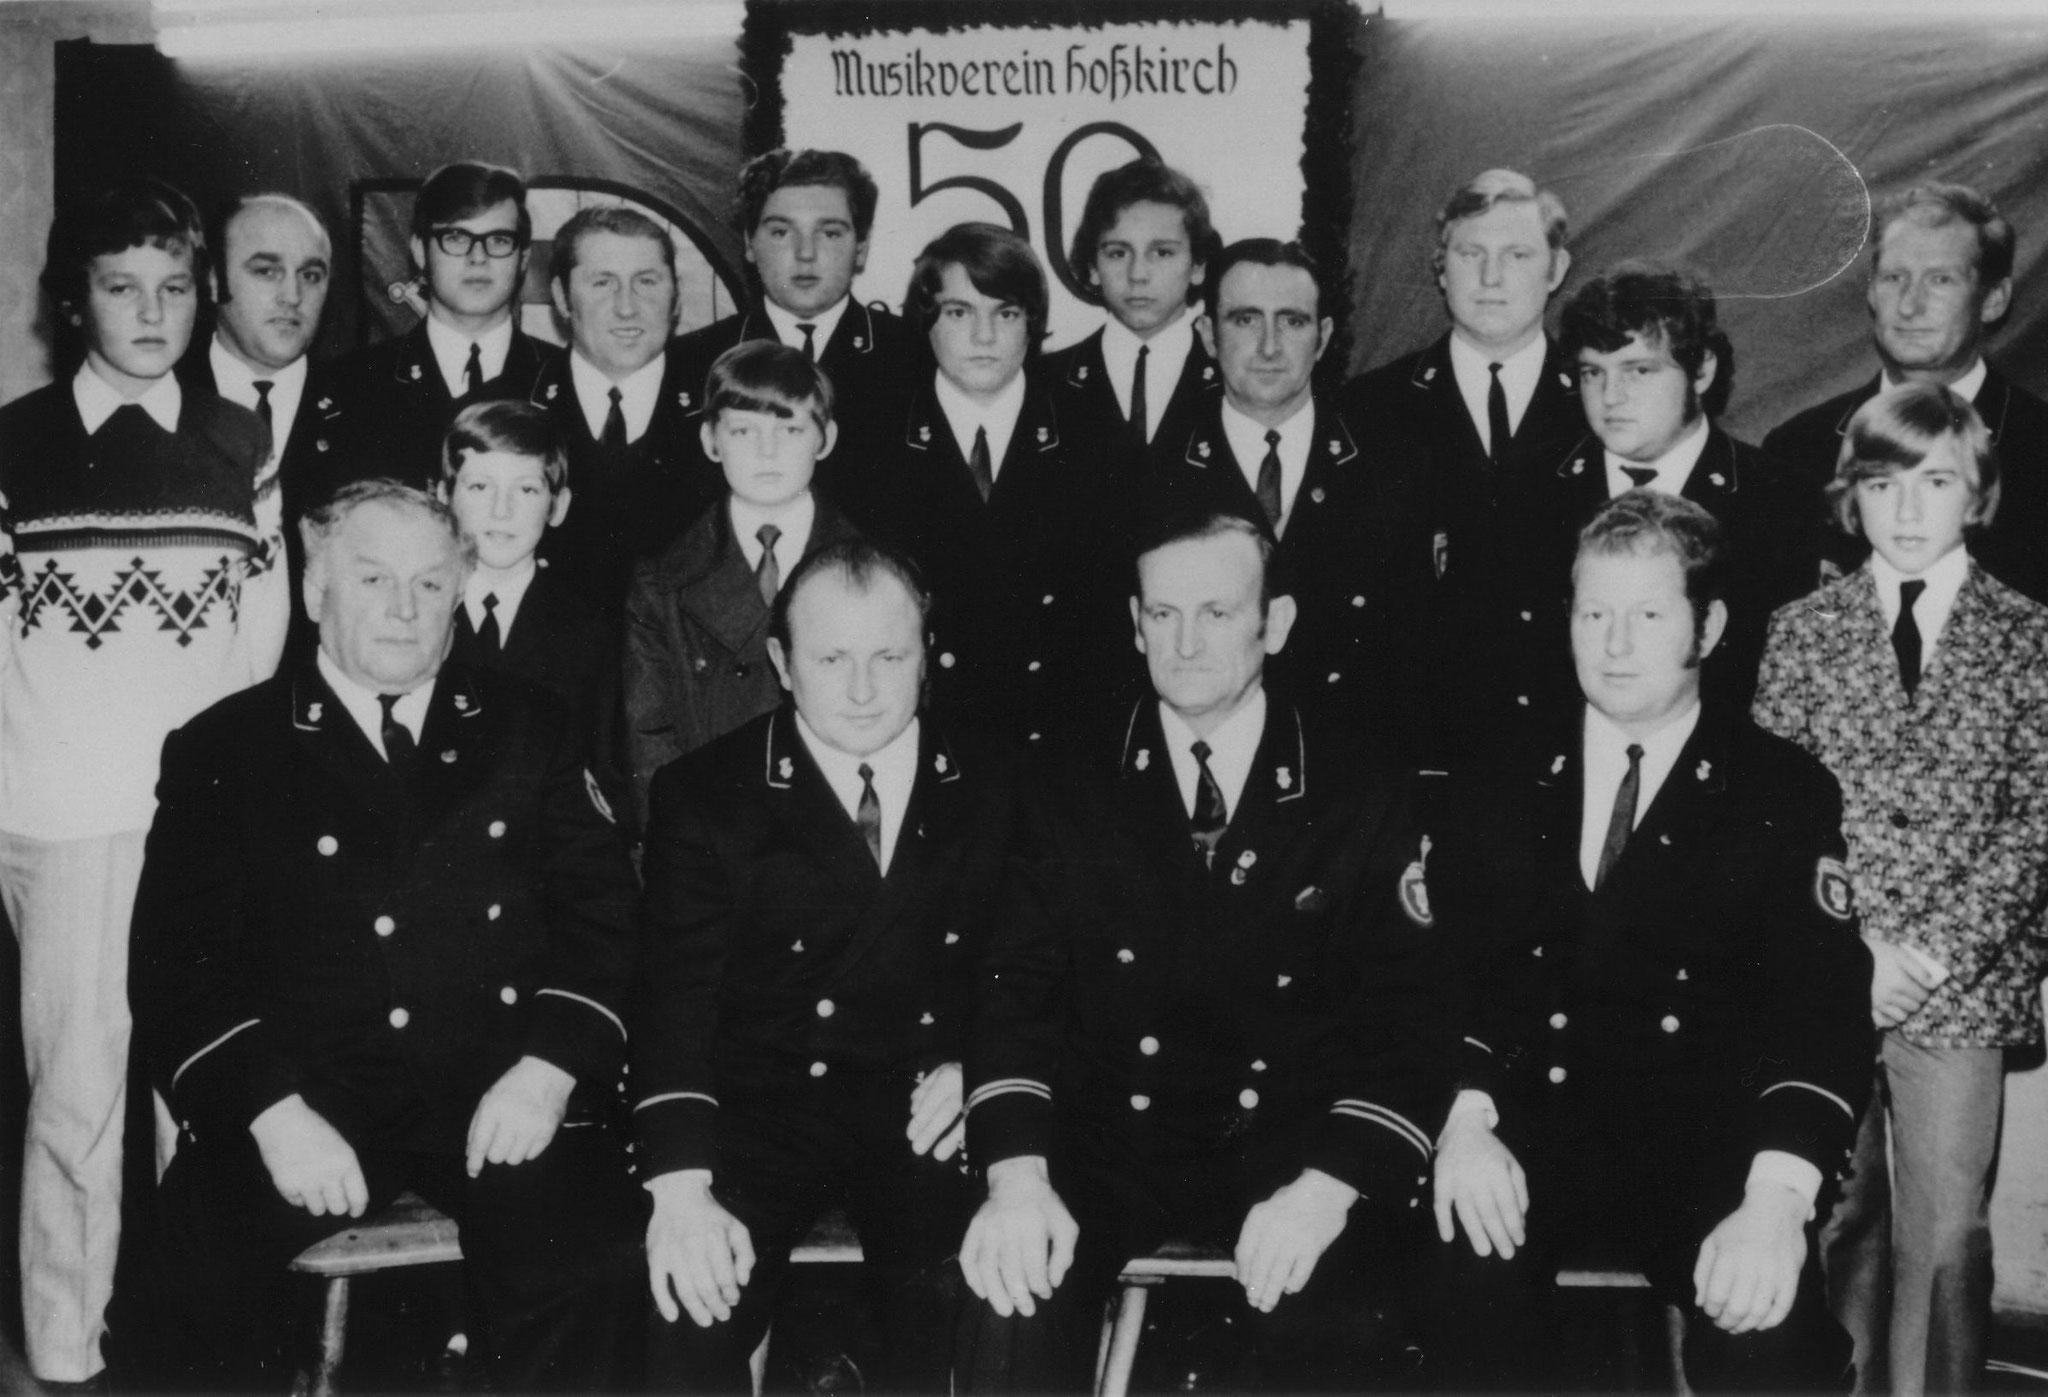 50 Jahre Musikverein Hoßkirch - 1971